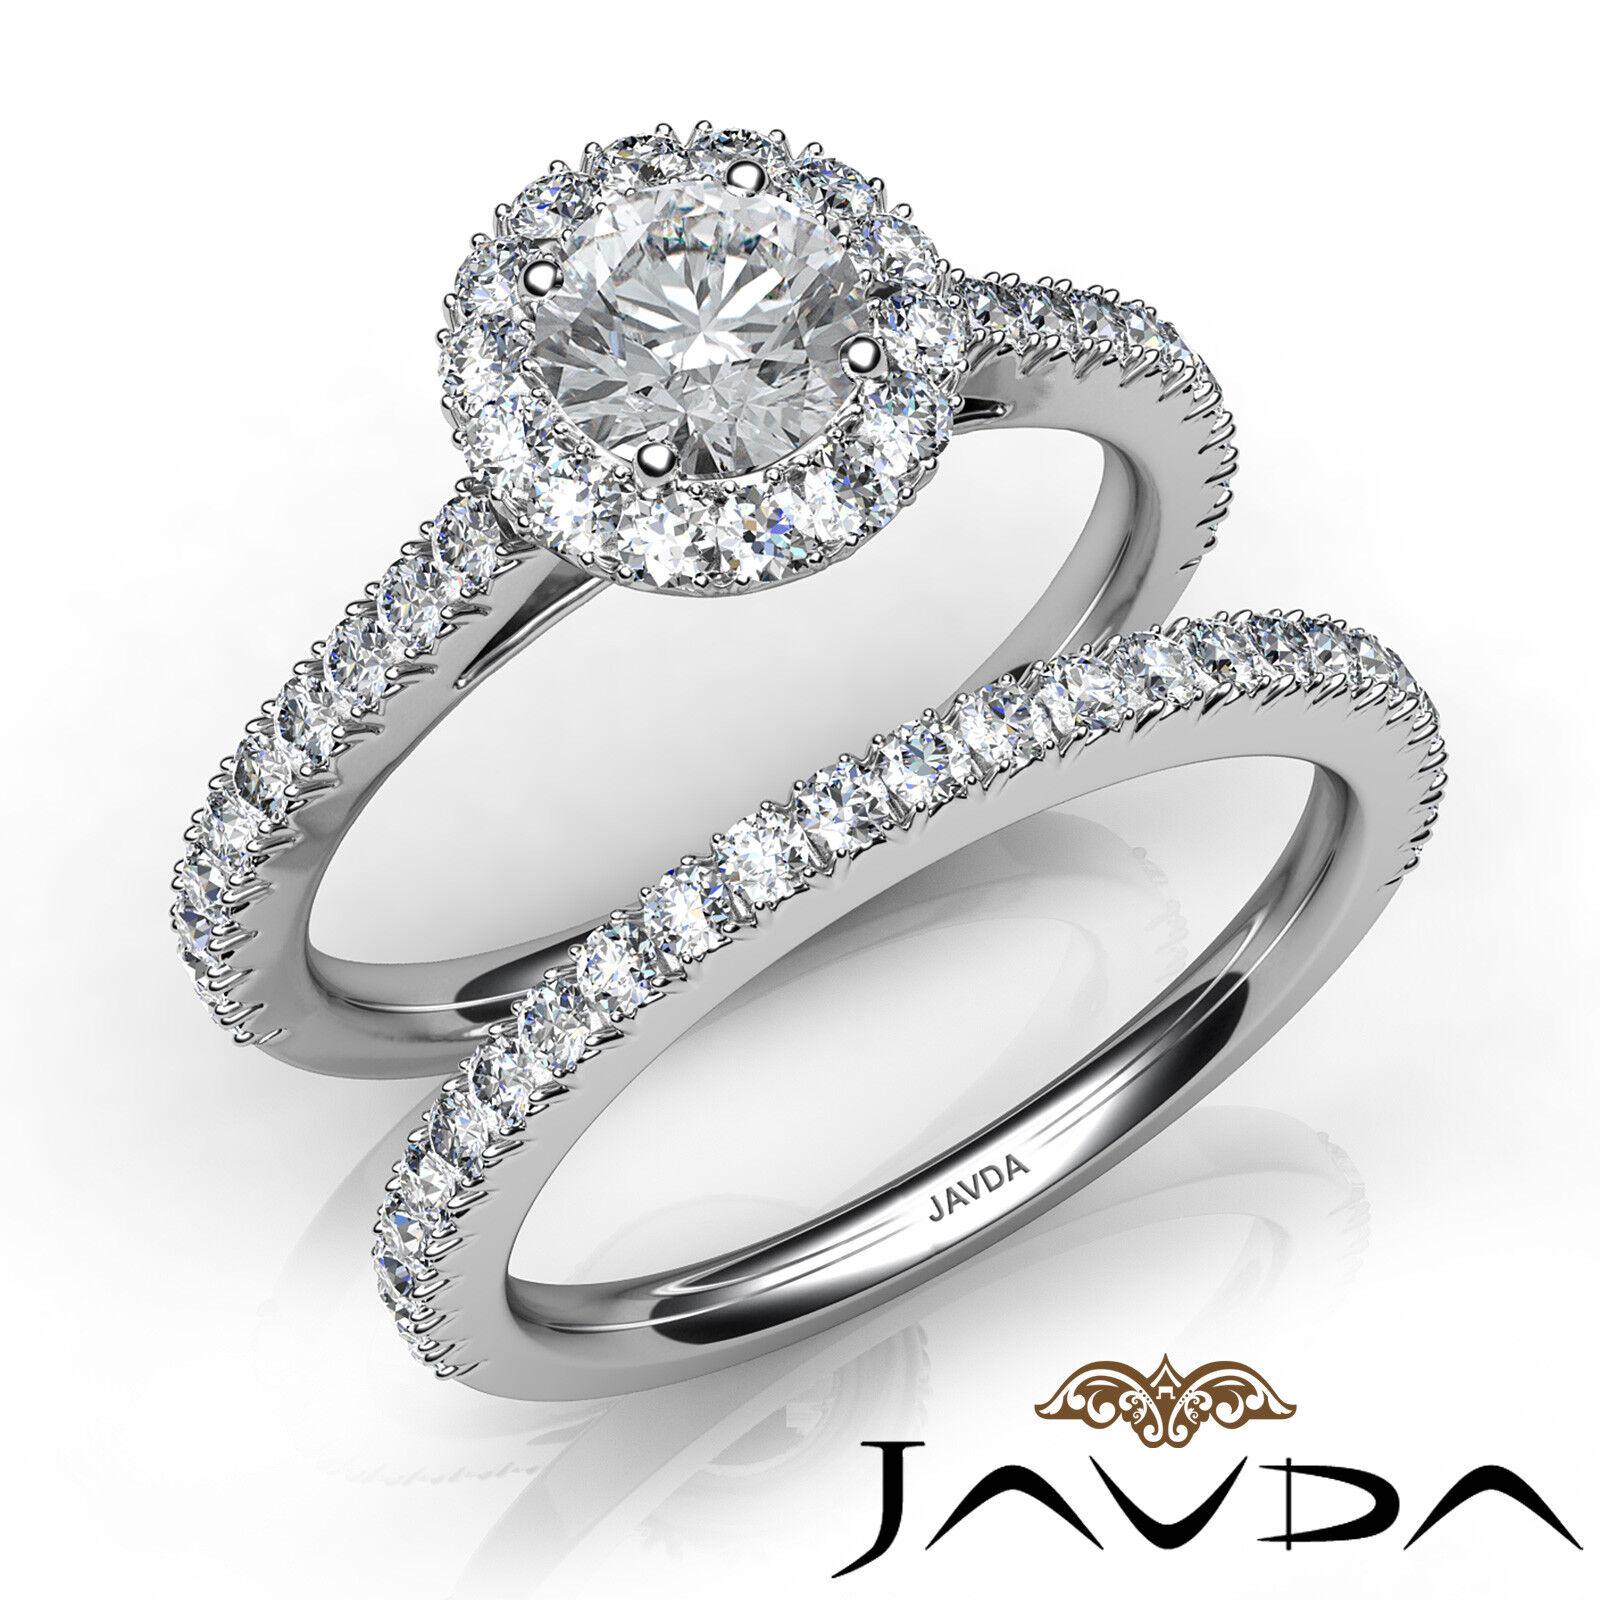 2 carat Round Diamond Engagement GIA E VS1 Platinum Prong Bezel Bridal Set Ring